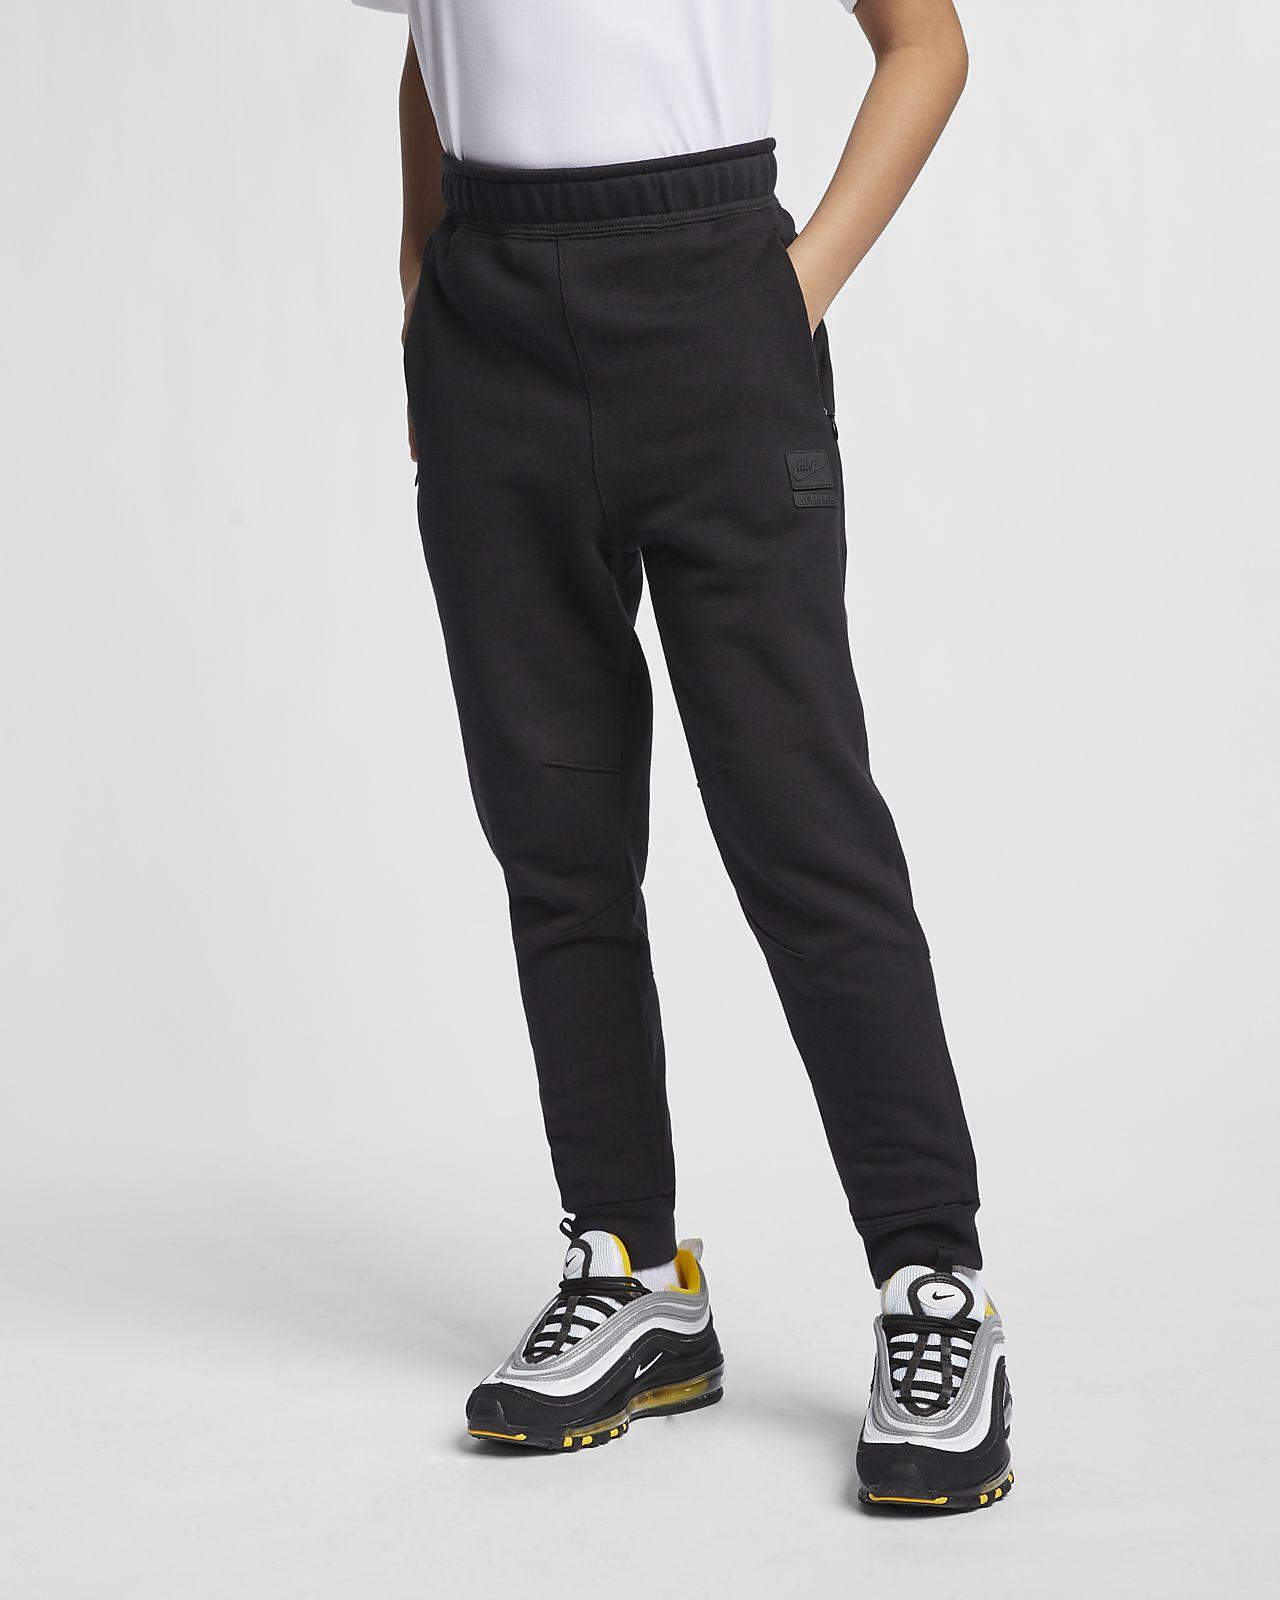 pantaloni ragazzo 14 anni nike